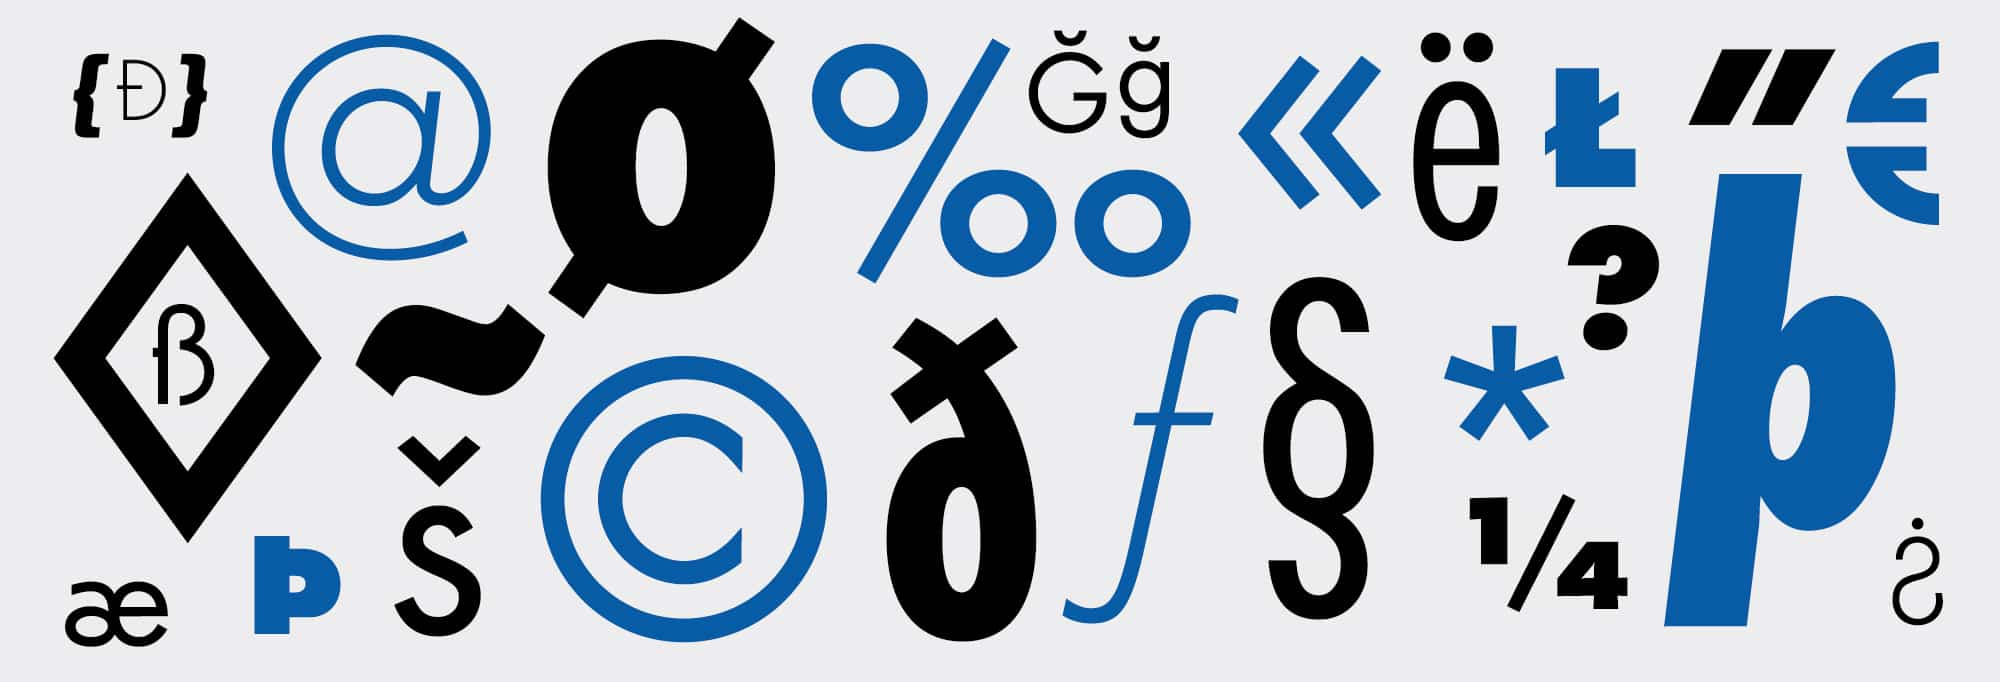 Free futura nd light - Abstract Fonts